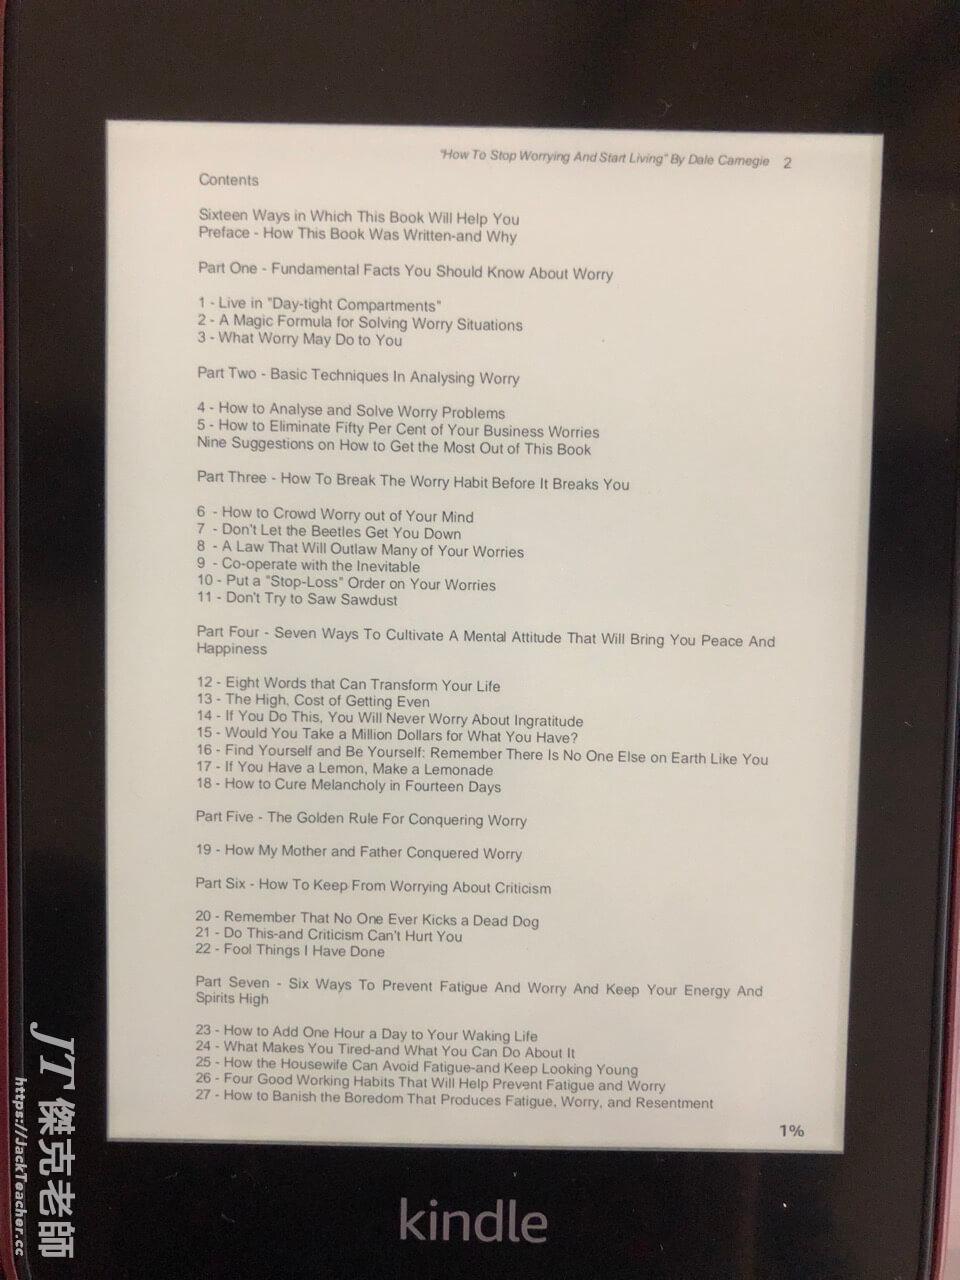 kindle中pdf也可以觀看,但是字真的非常小,看的眼腈是很不舒服的。